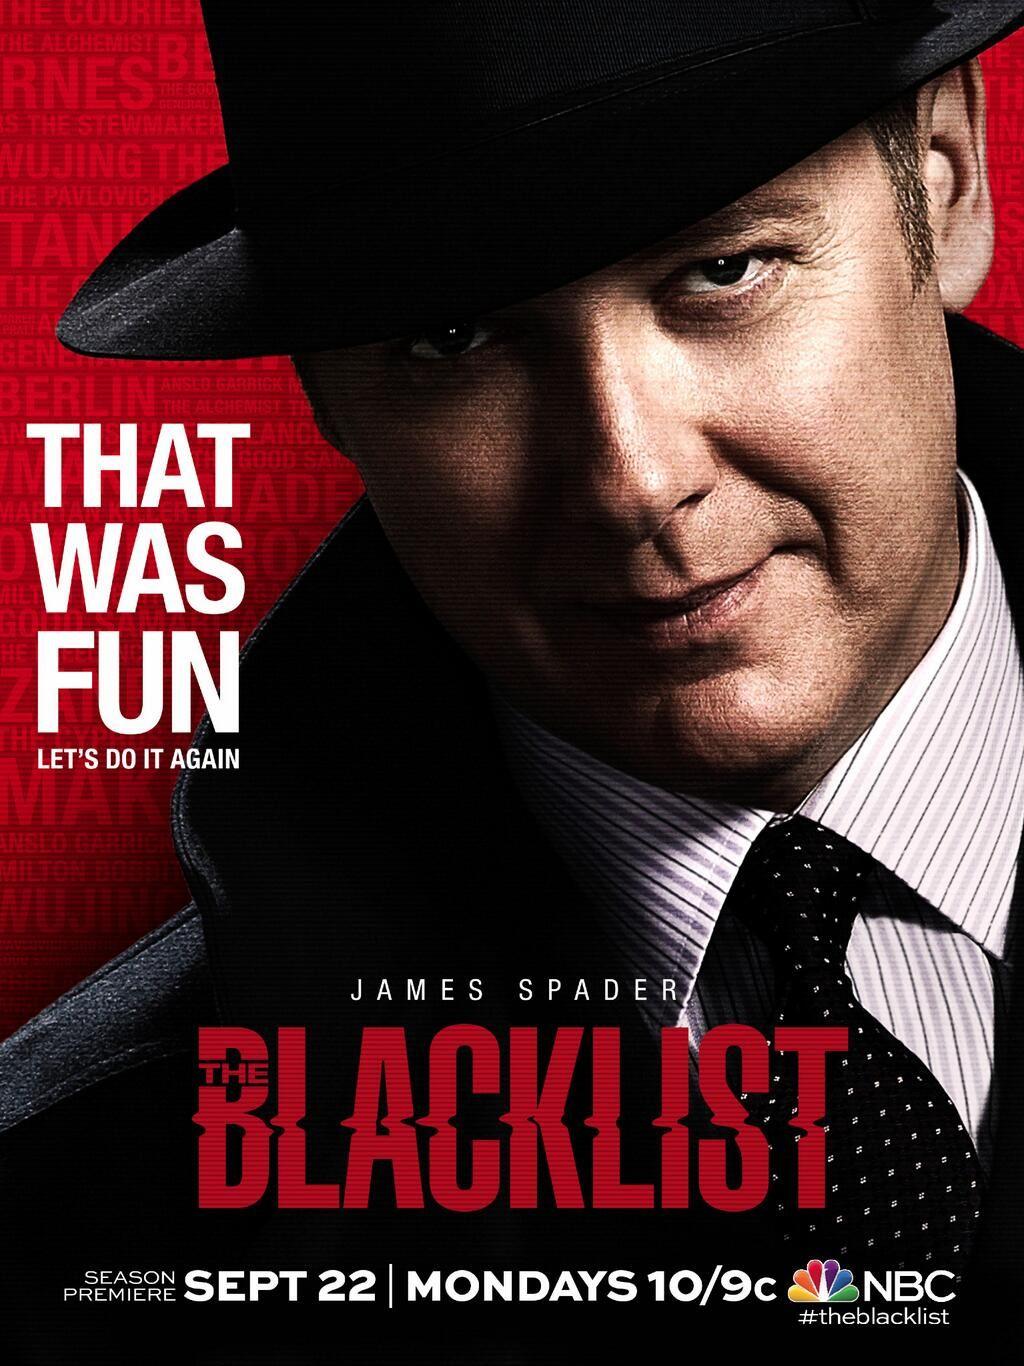 He S Coming Theblacklist In 2019 The Blacklist James Spader